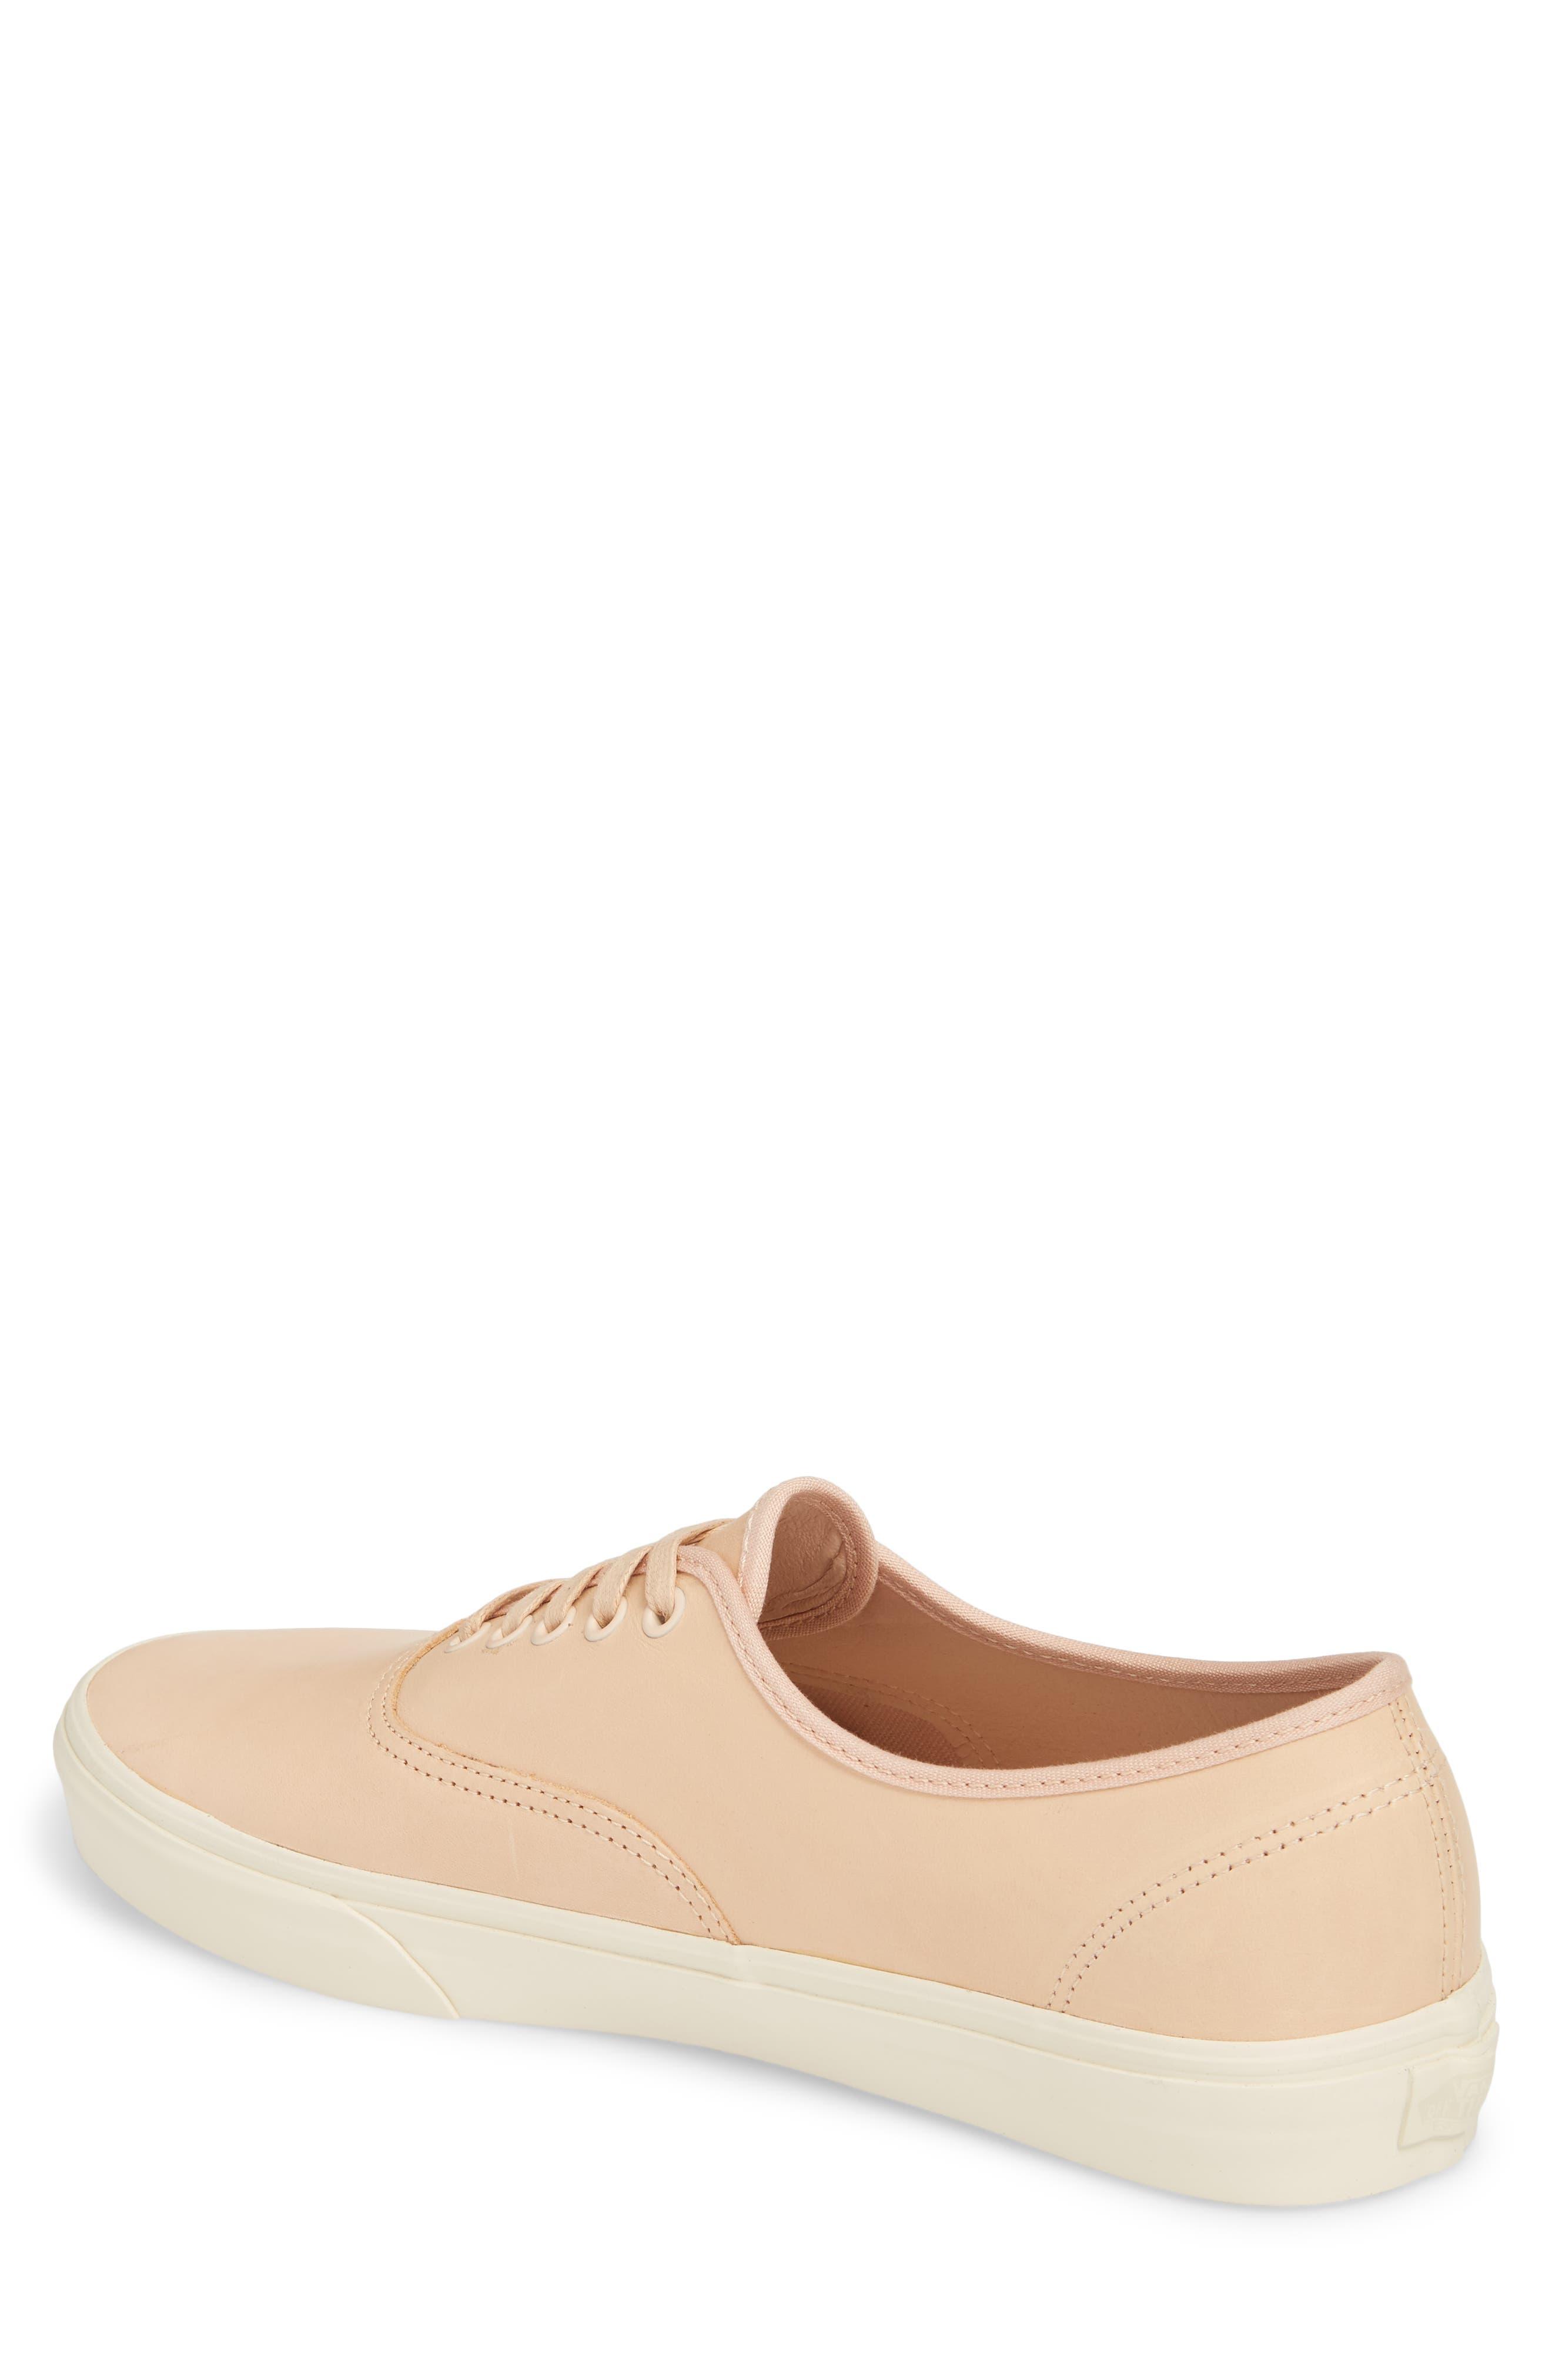 Authentic DX Sneaker,                             Alternate thumbnail 2, color,                             Veggie Tan Leather